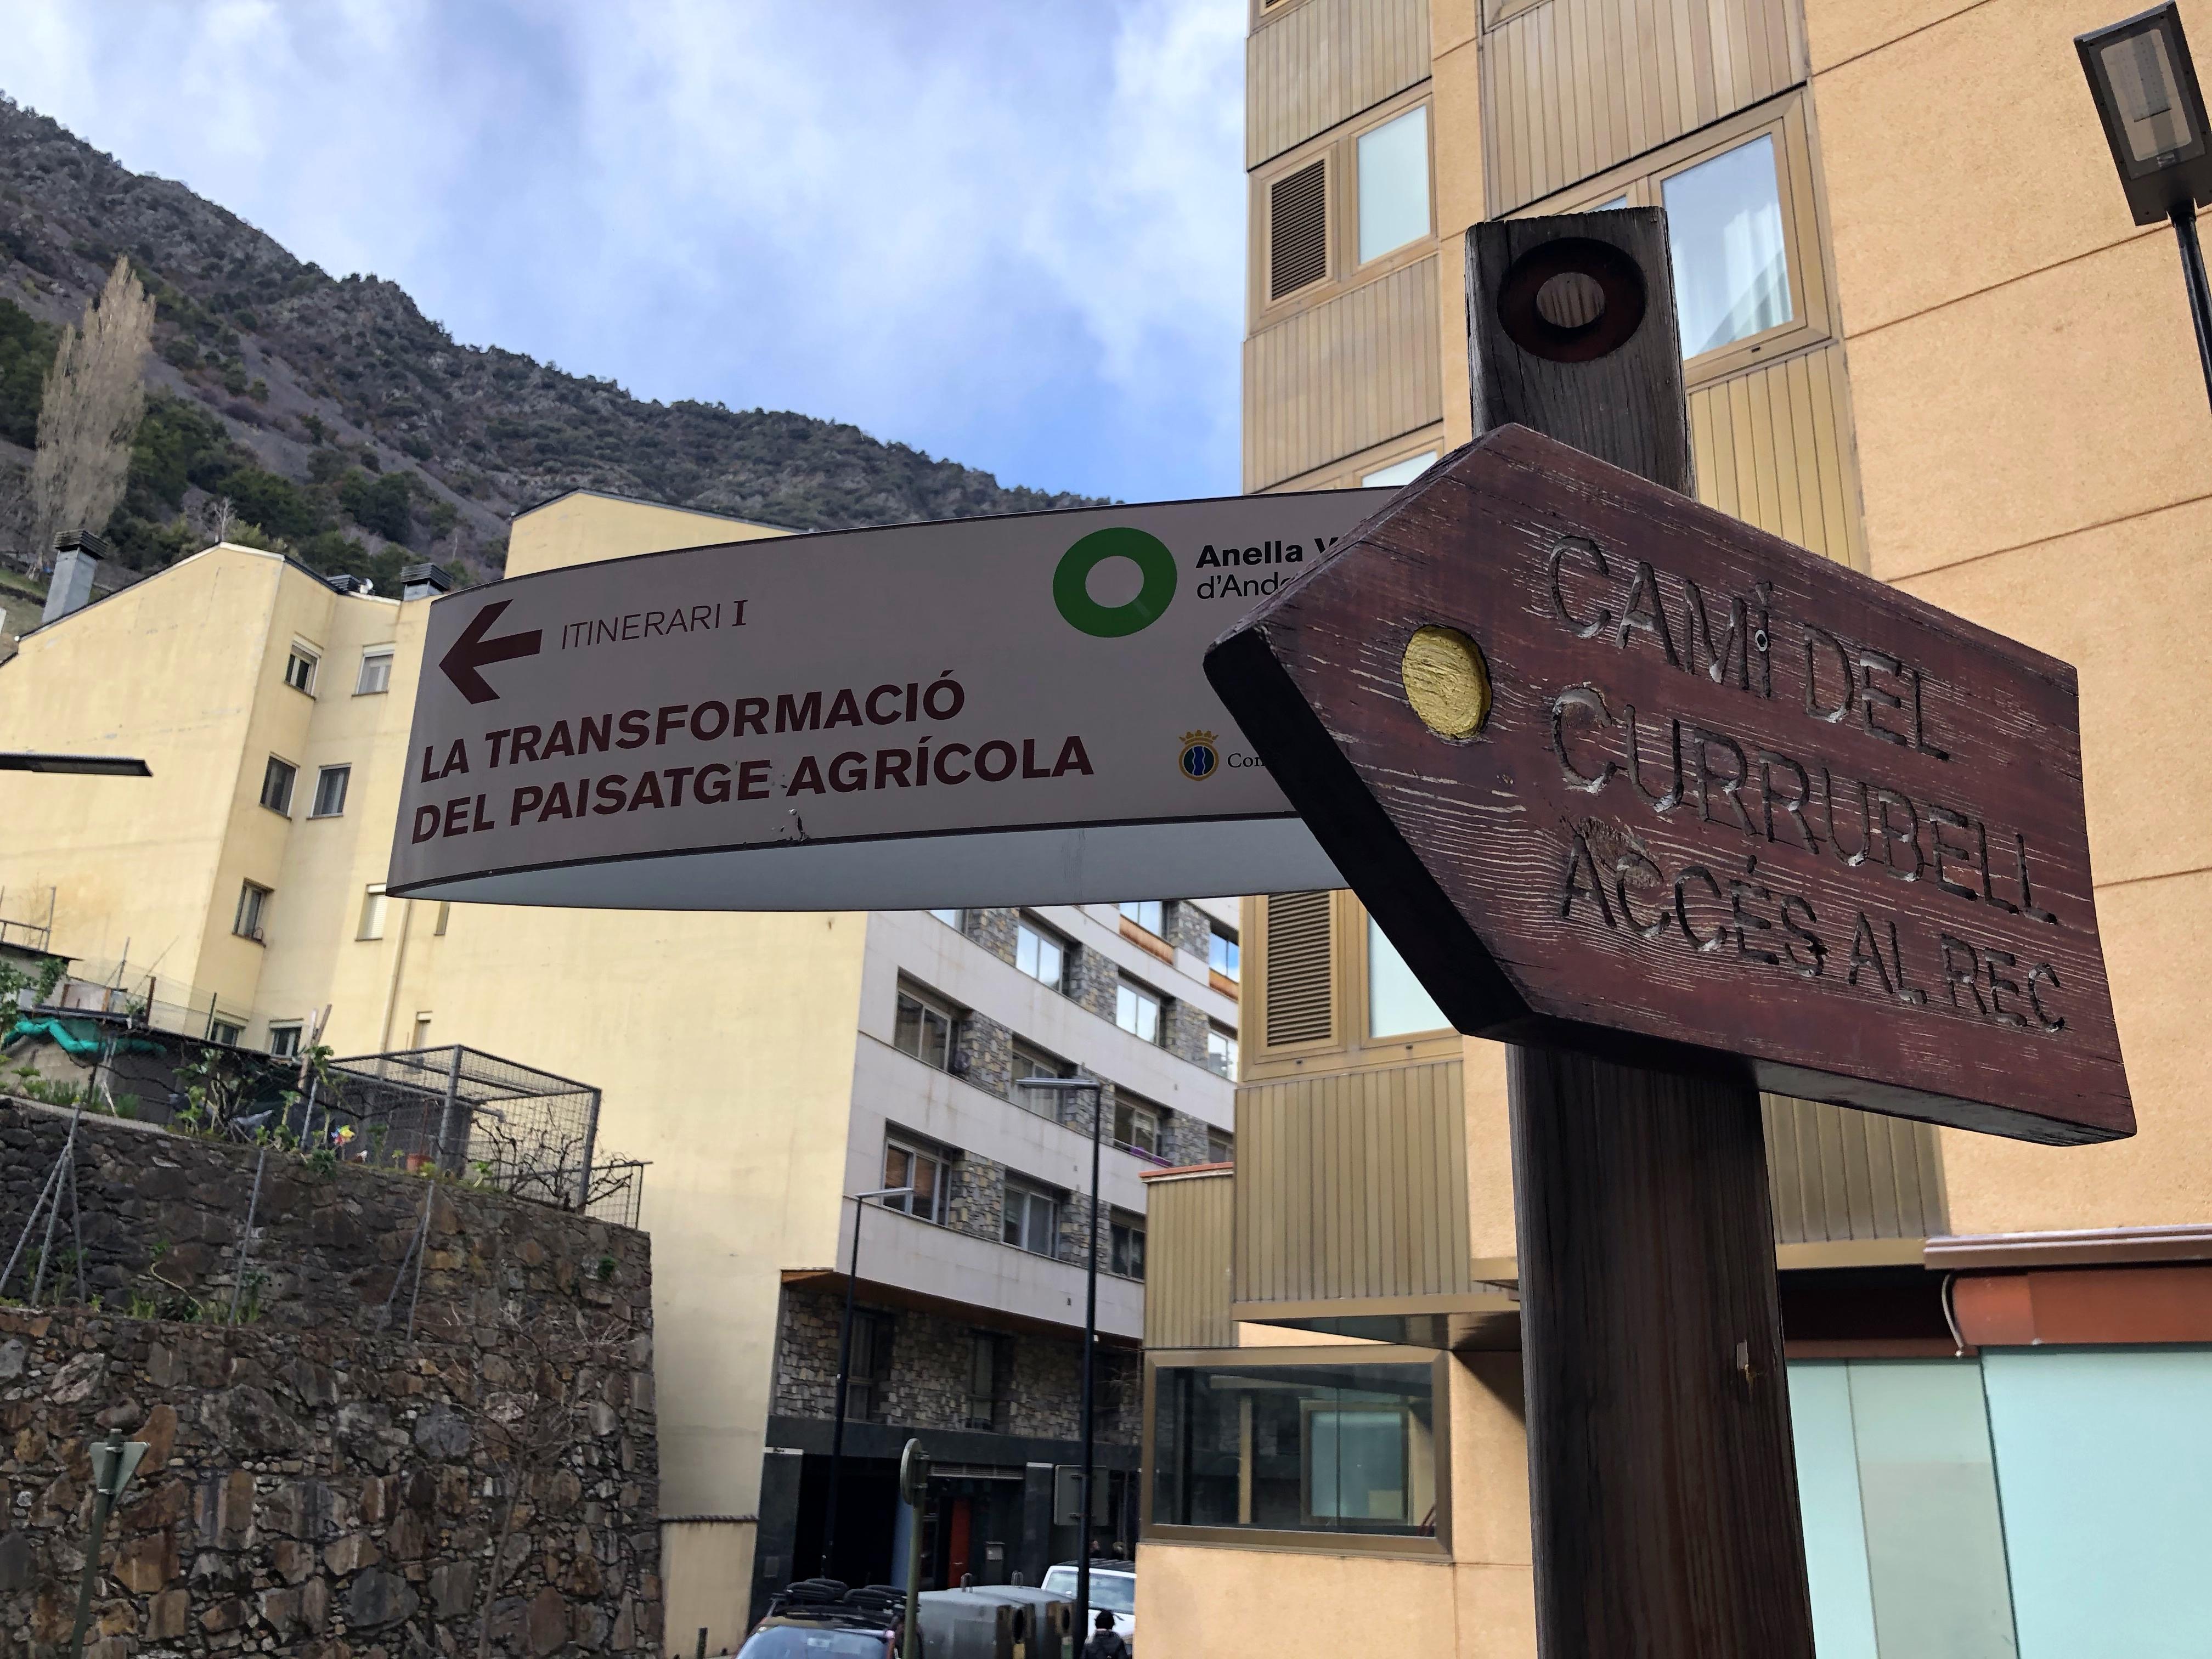 Andorra, Andorra La Vella, 2018